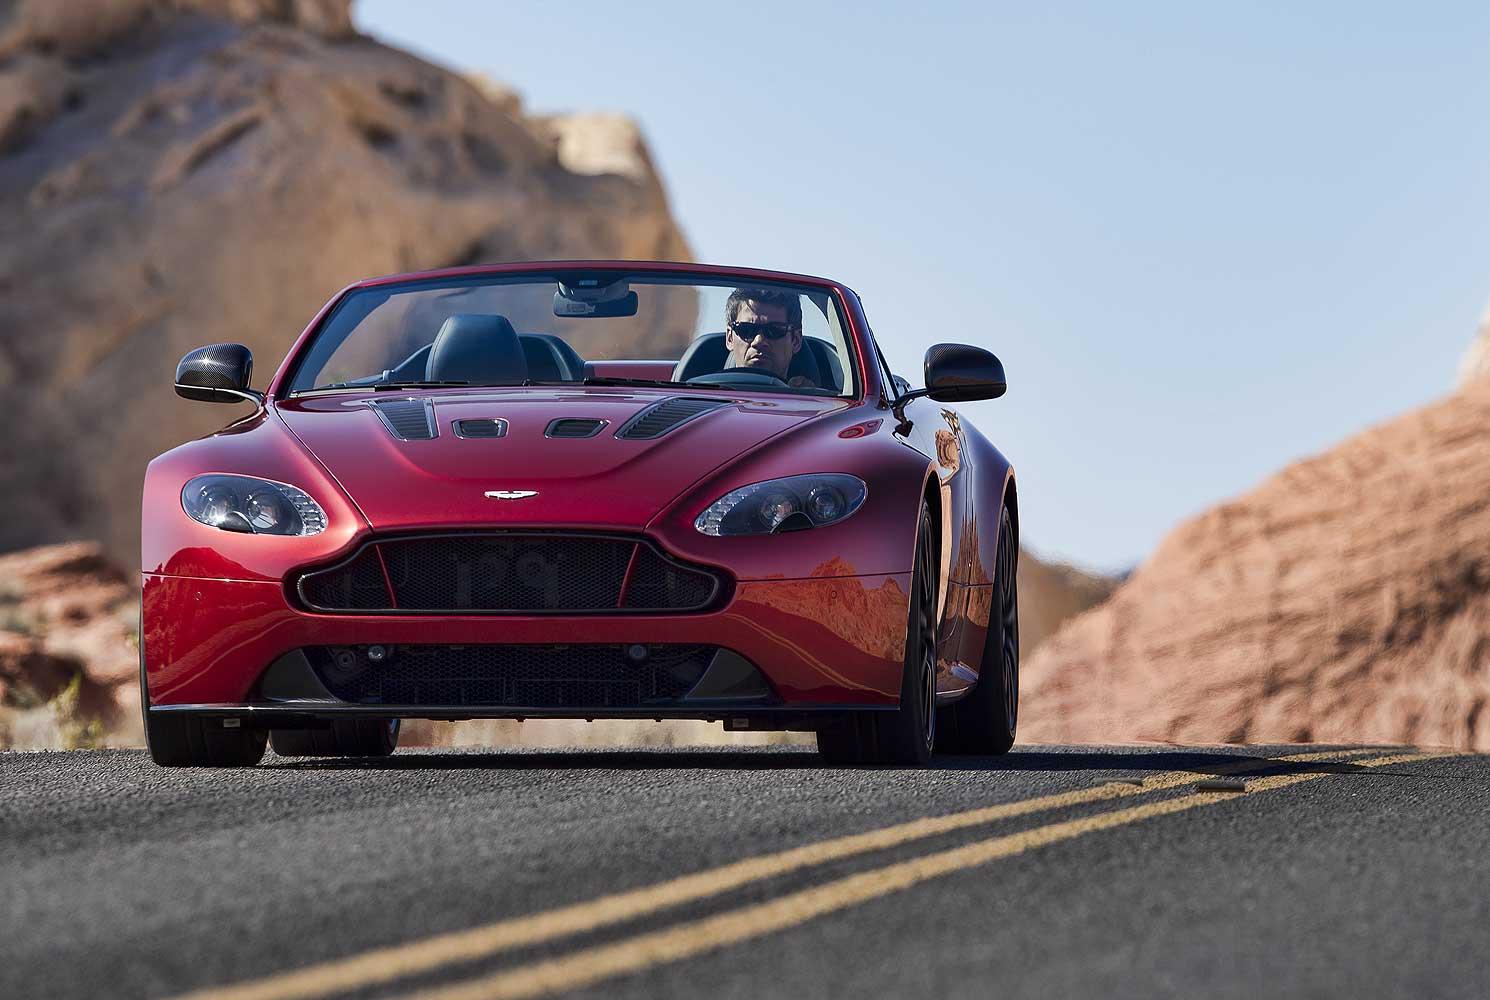 2014 Aston Martin V12 Vantage S Roadster 26